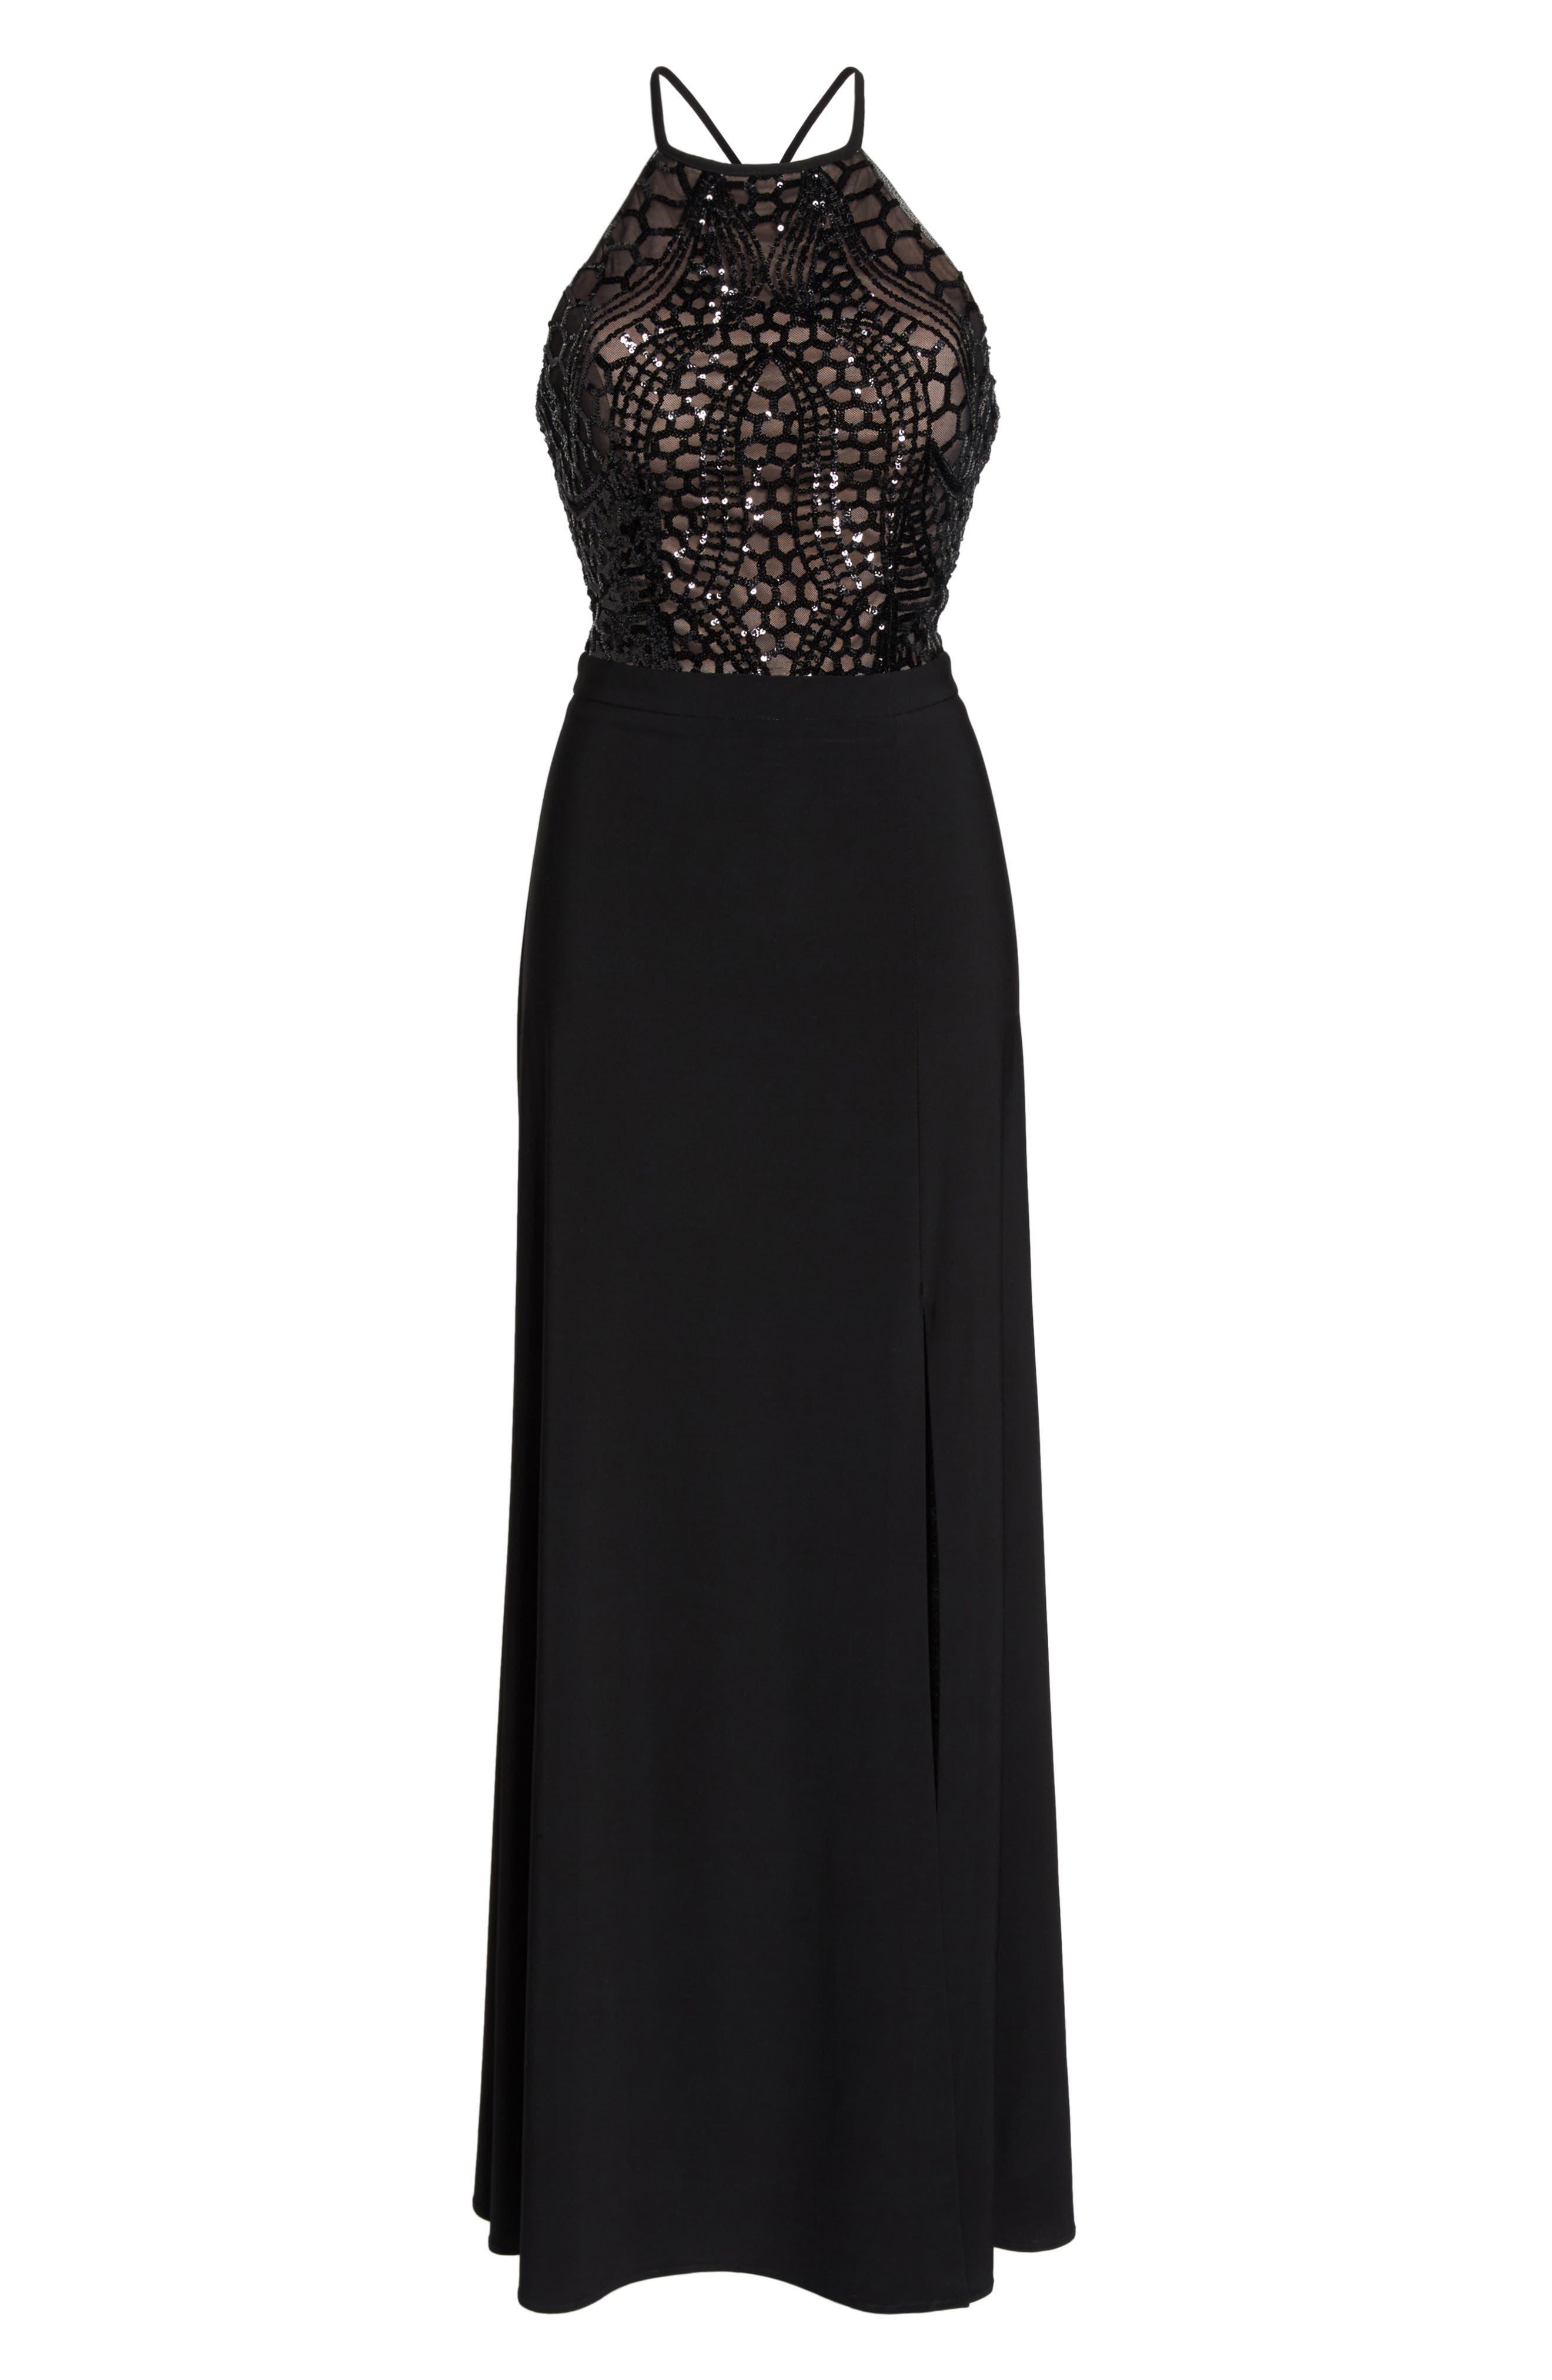 Sequin Halter Gown,                             Alternate thumbnail 6, color,                             BLACK/ NUDE